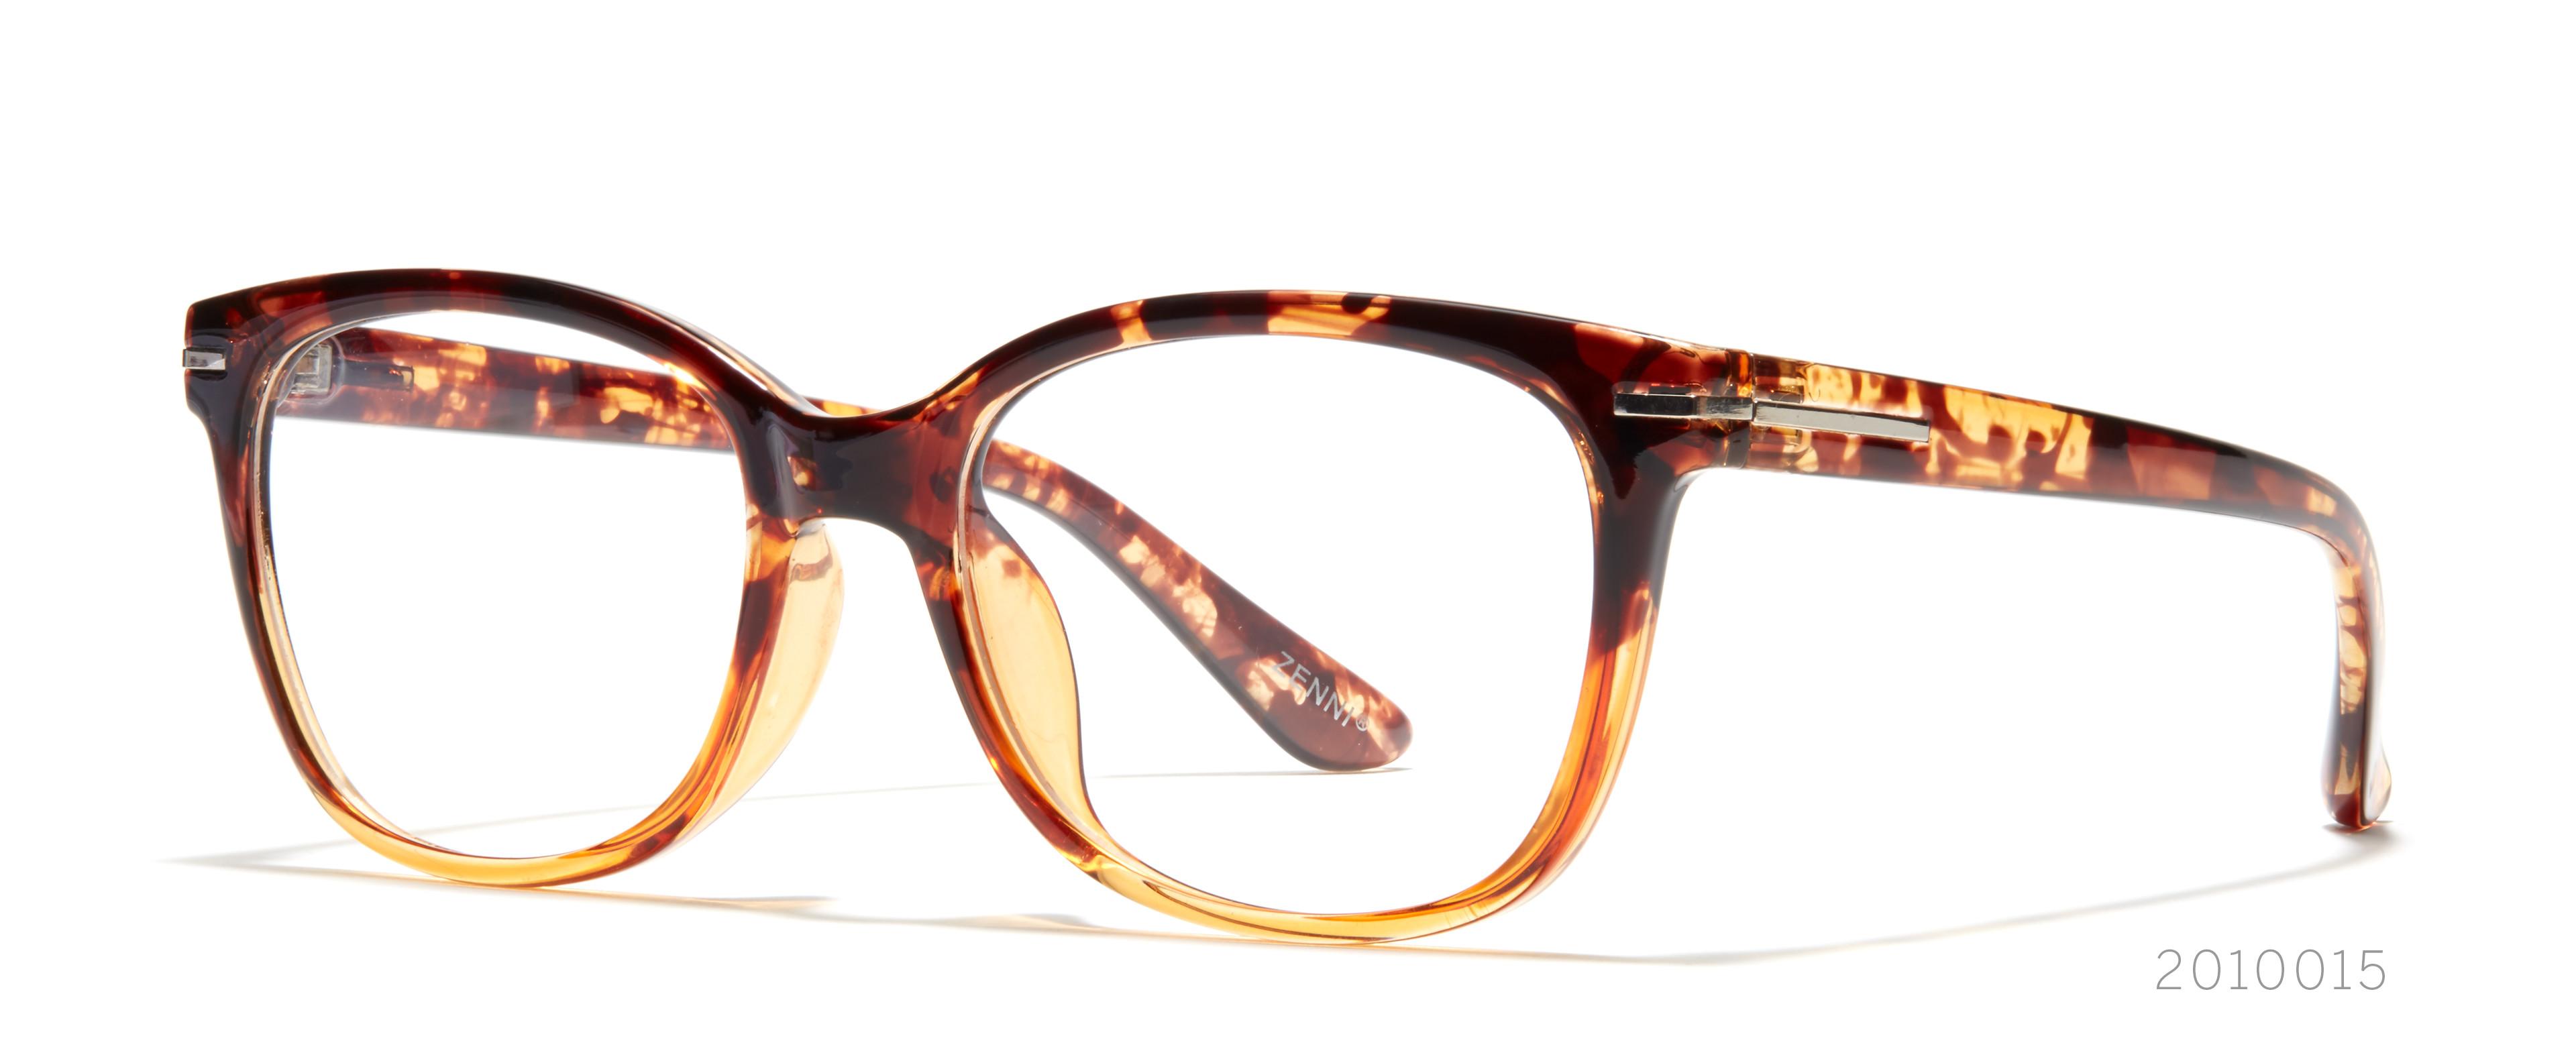 eyeglasses for round face